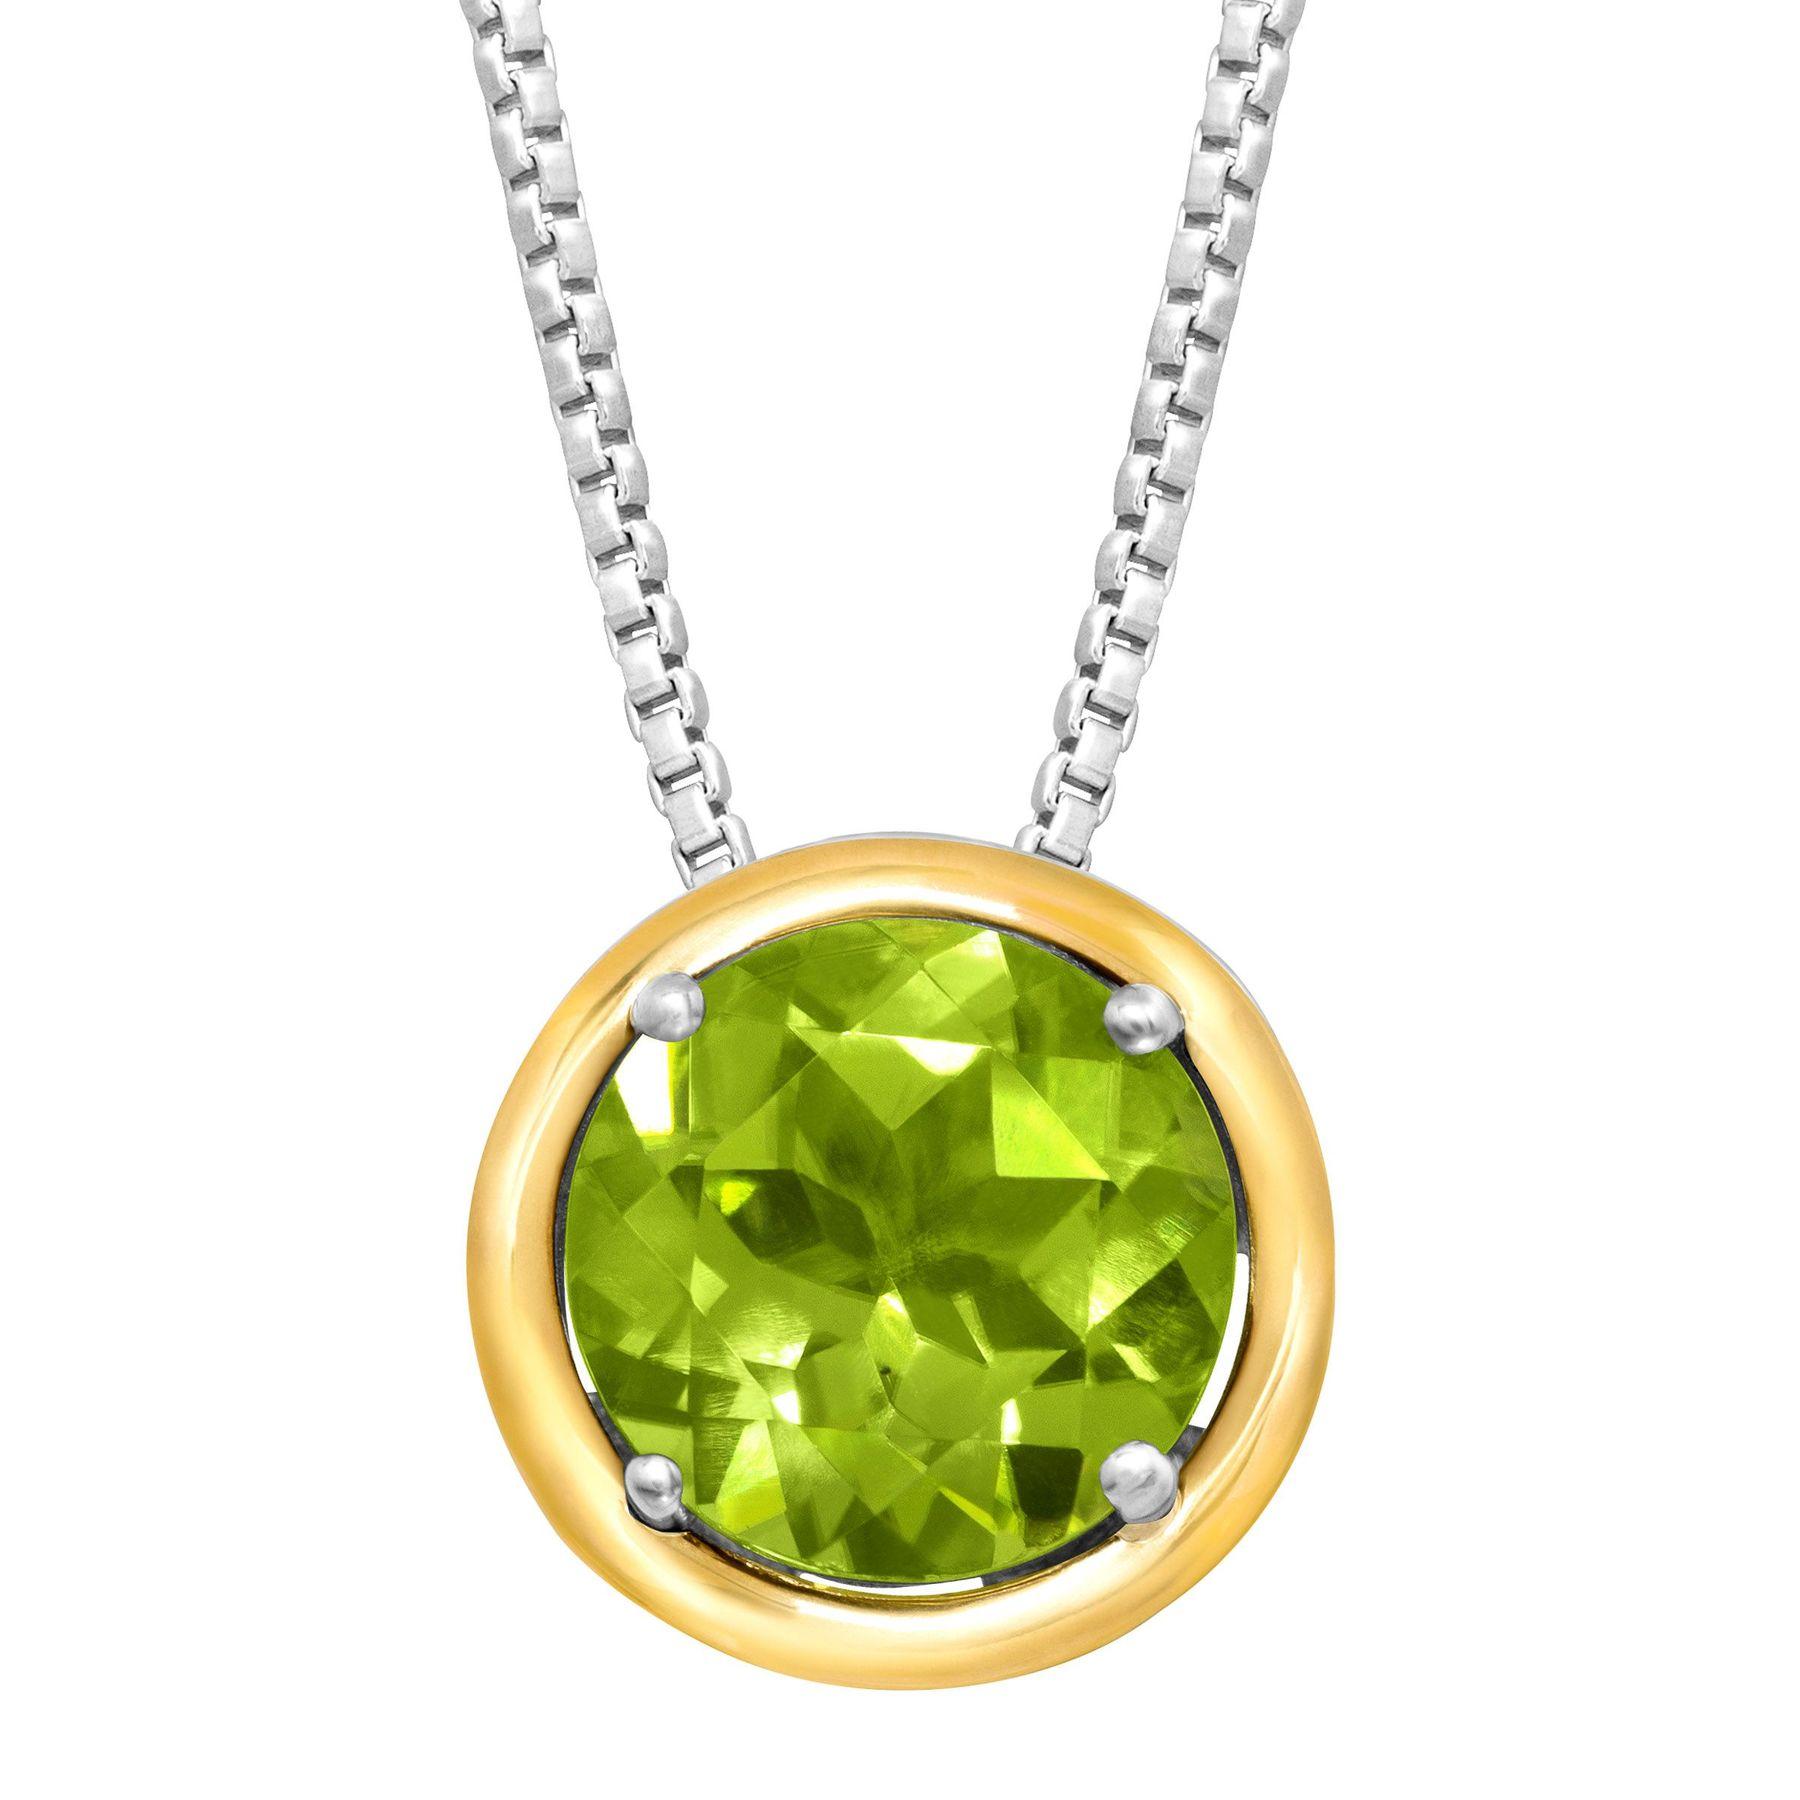 2 ct natural peridot pendant in sterling silver 14k gold 2 ct 2 ct peridot pendant aloadofball Gallery